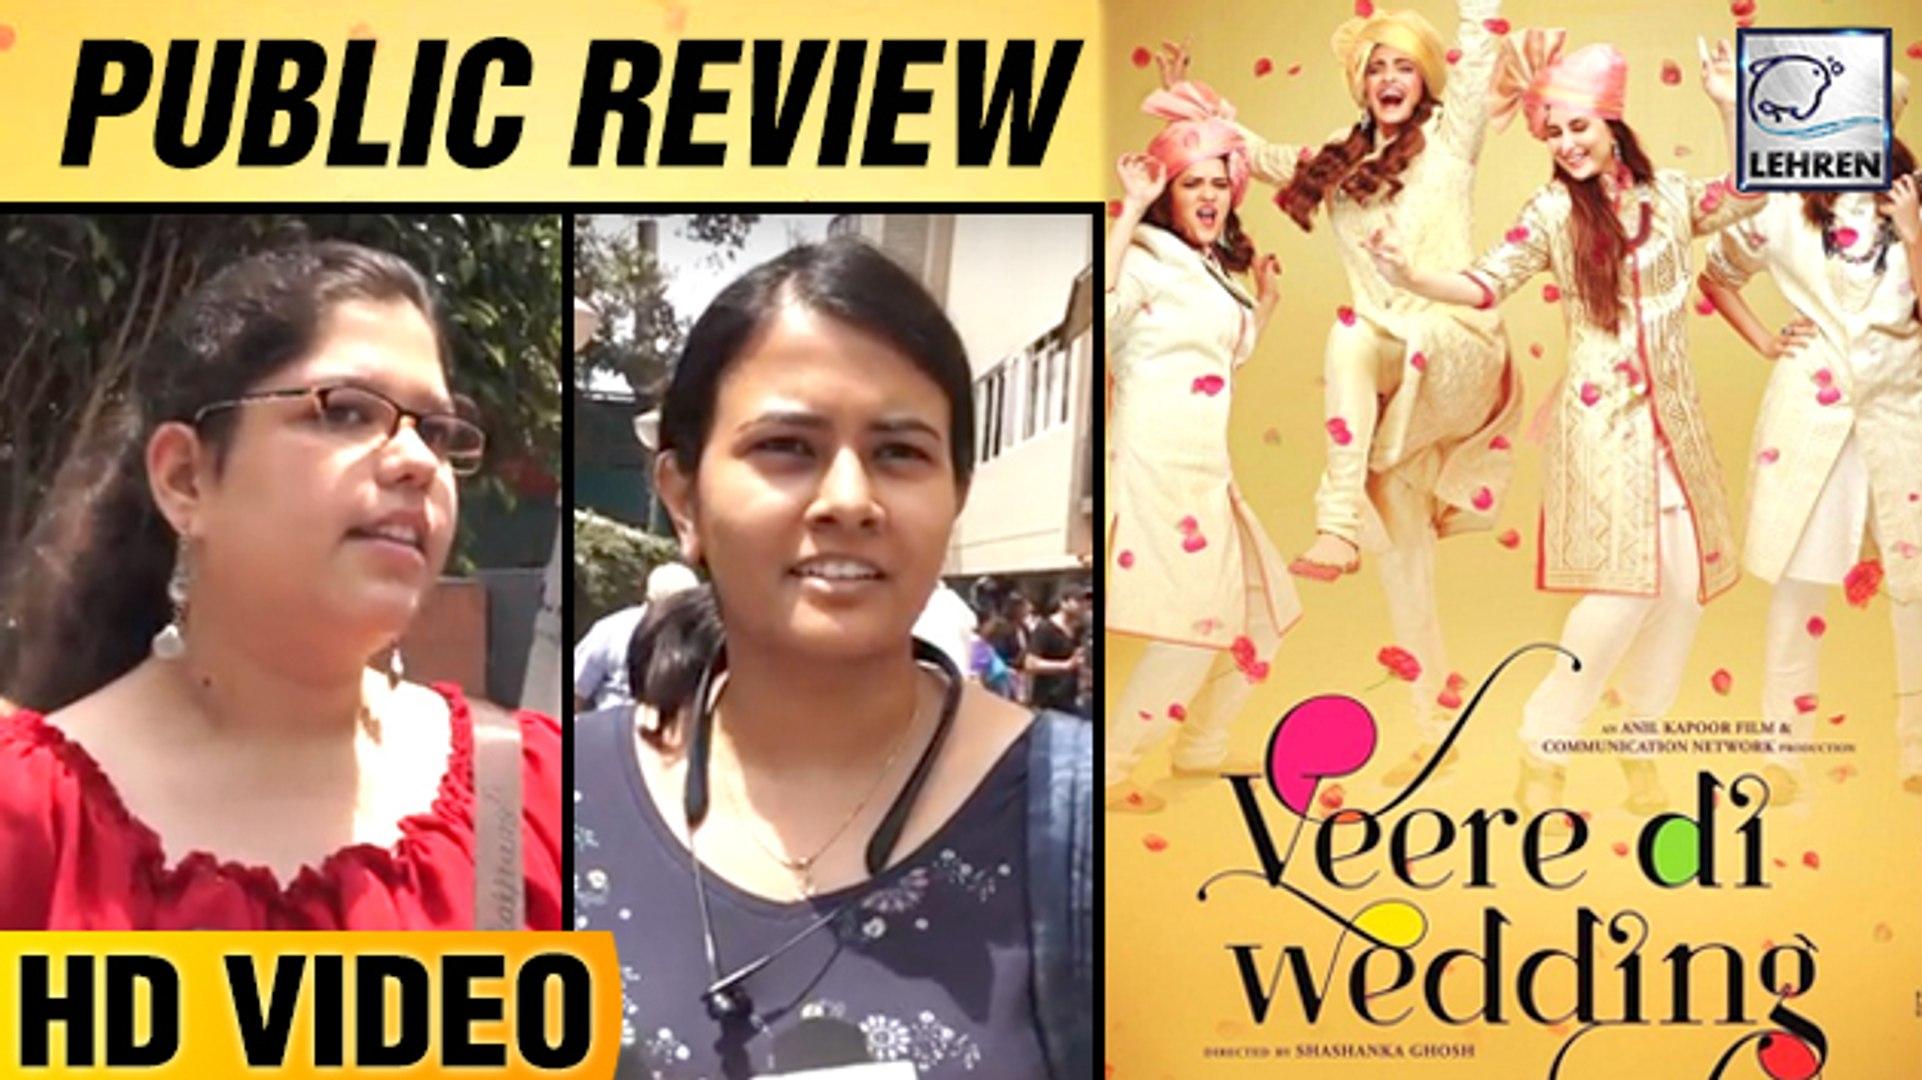 Veere Di Wedding Reviews.Veere Di Wedding Public Review Sonam Kapoor Kareena Kapoor Swara Bhasker